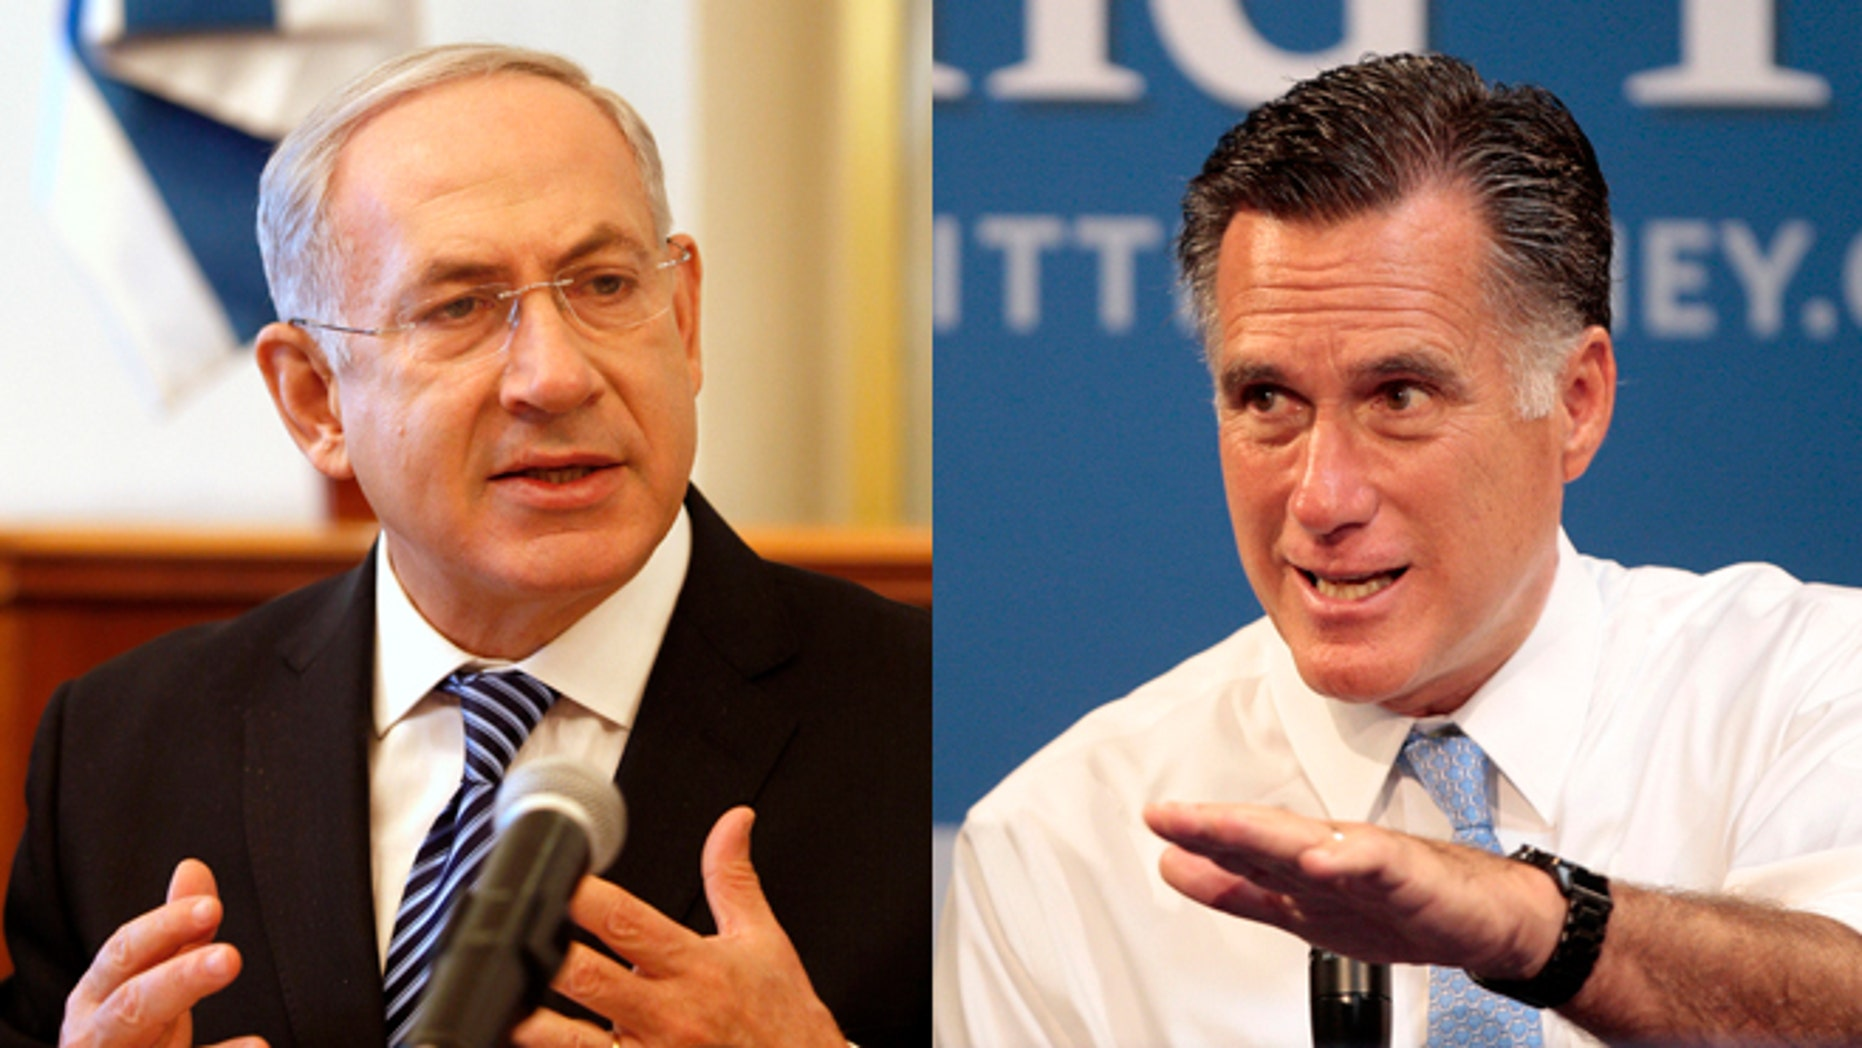 Shown here are Israeli Prime Minister Benjamin Netanyahu, left, and GOP presidential candidate Mitt Romney.